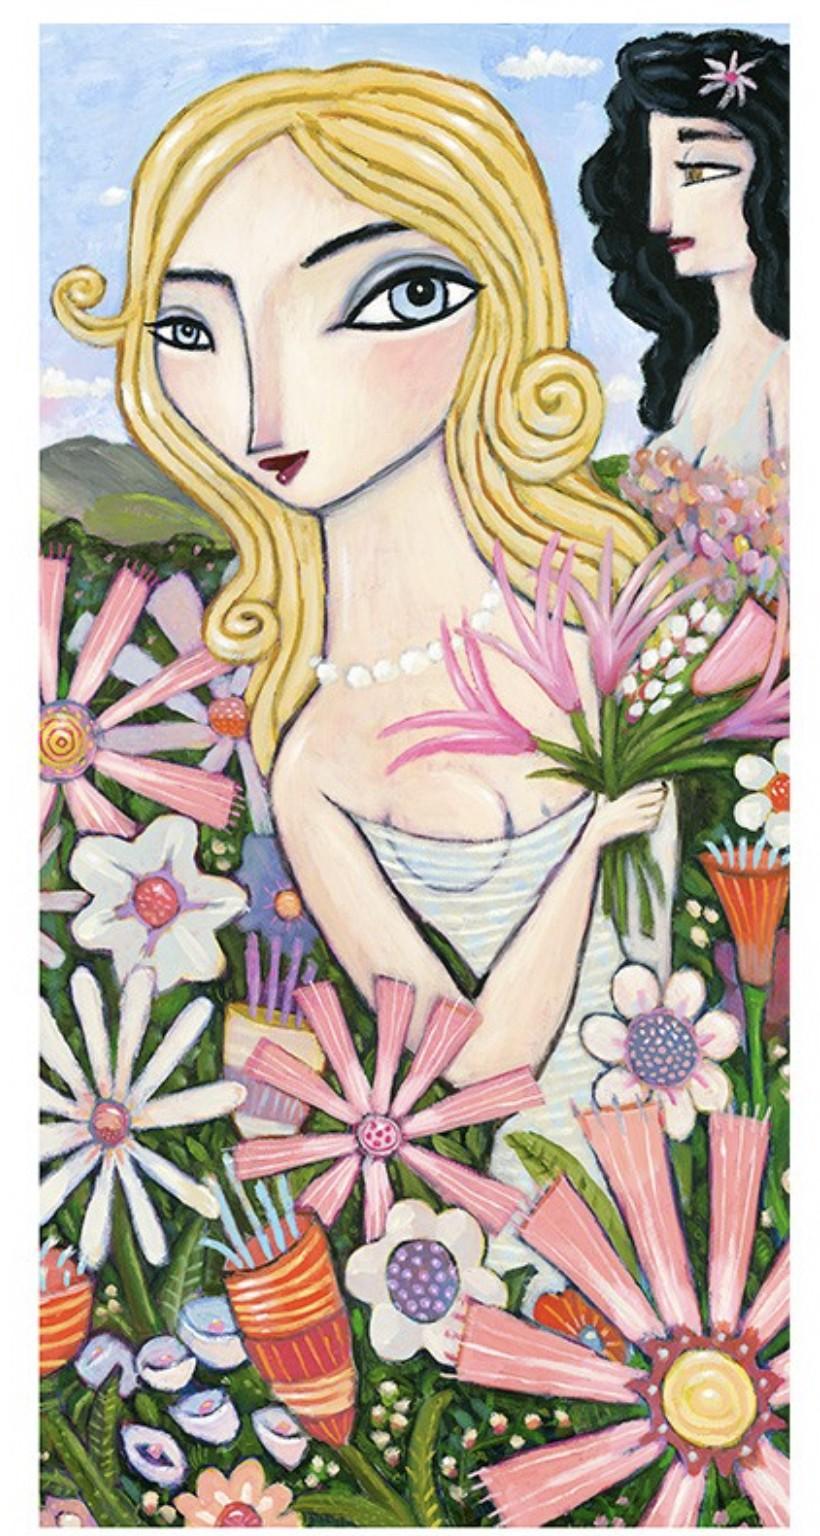 Spring Flowers - Kaufmann, Charles - k-CHK396